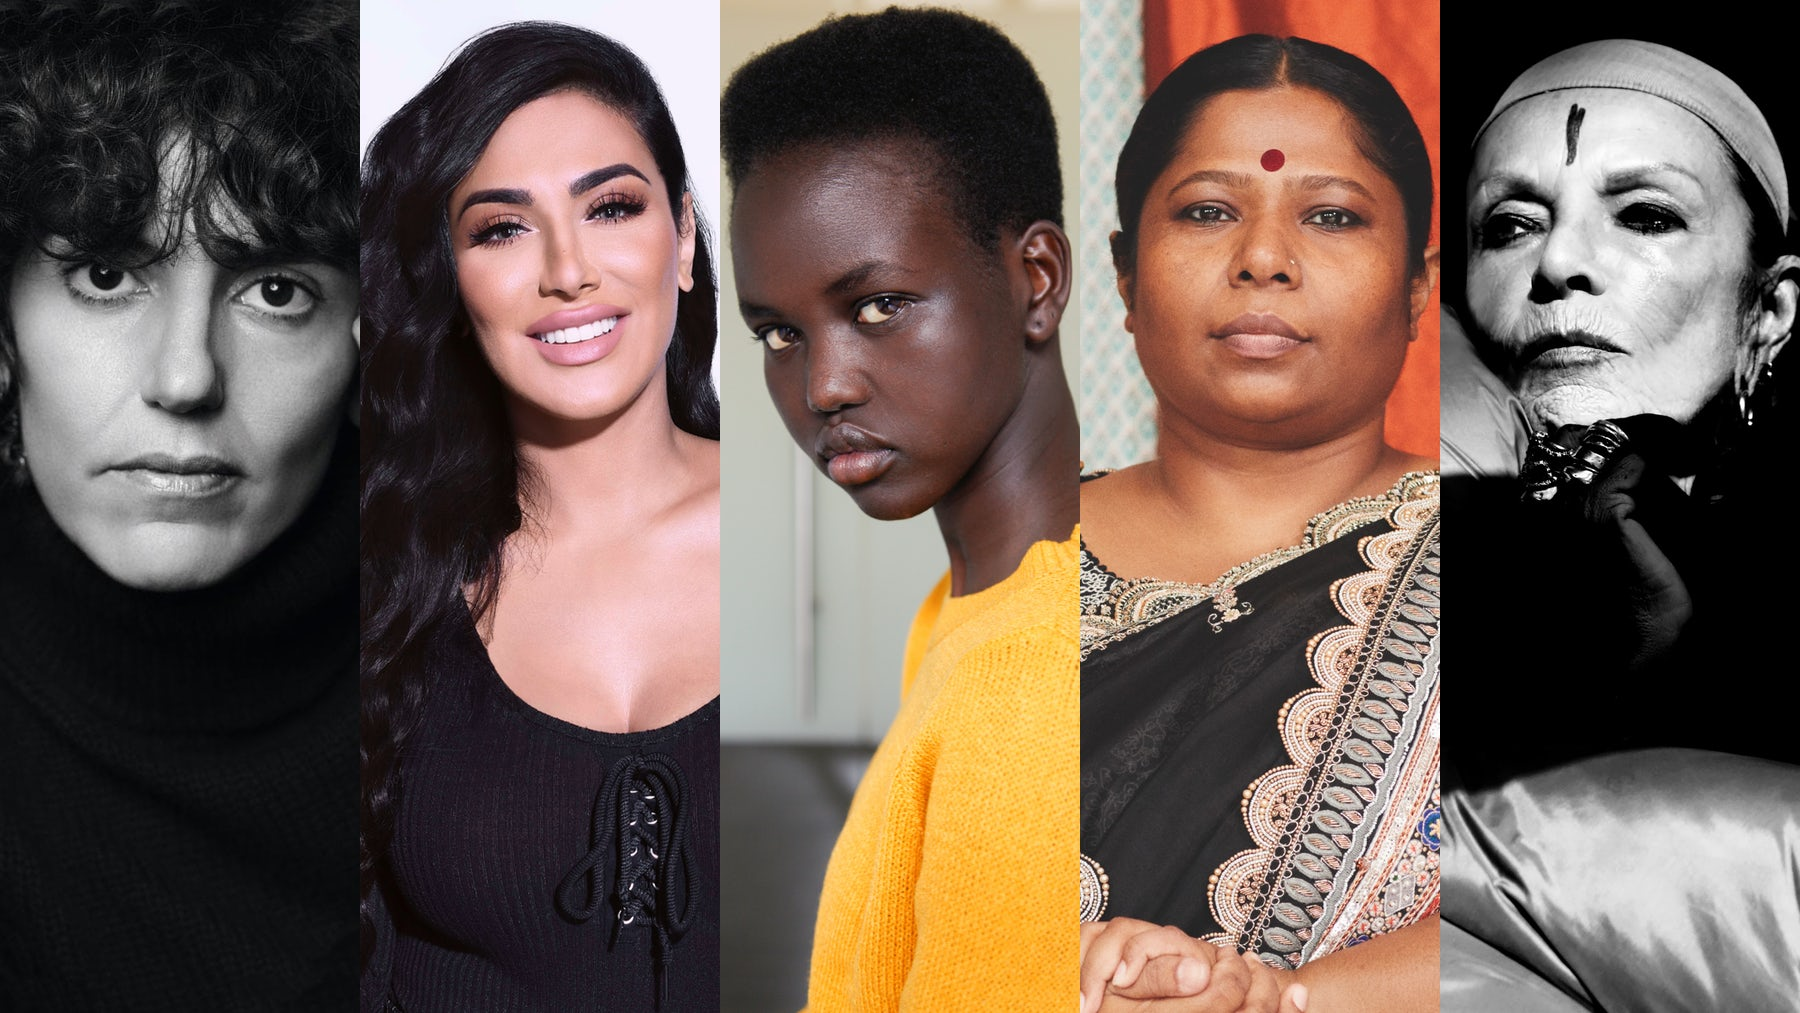 Francesca Bellettini, Huda Kattan, Adut Akech, Kalpona Akter and Michèle Lamy | Source: Courtesy